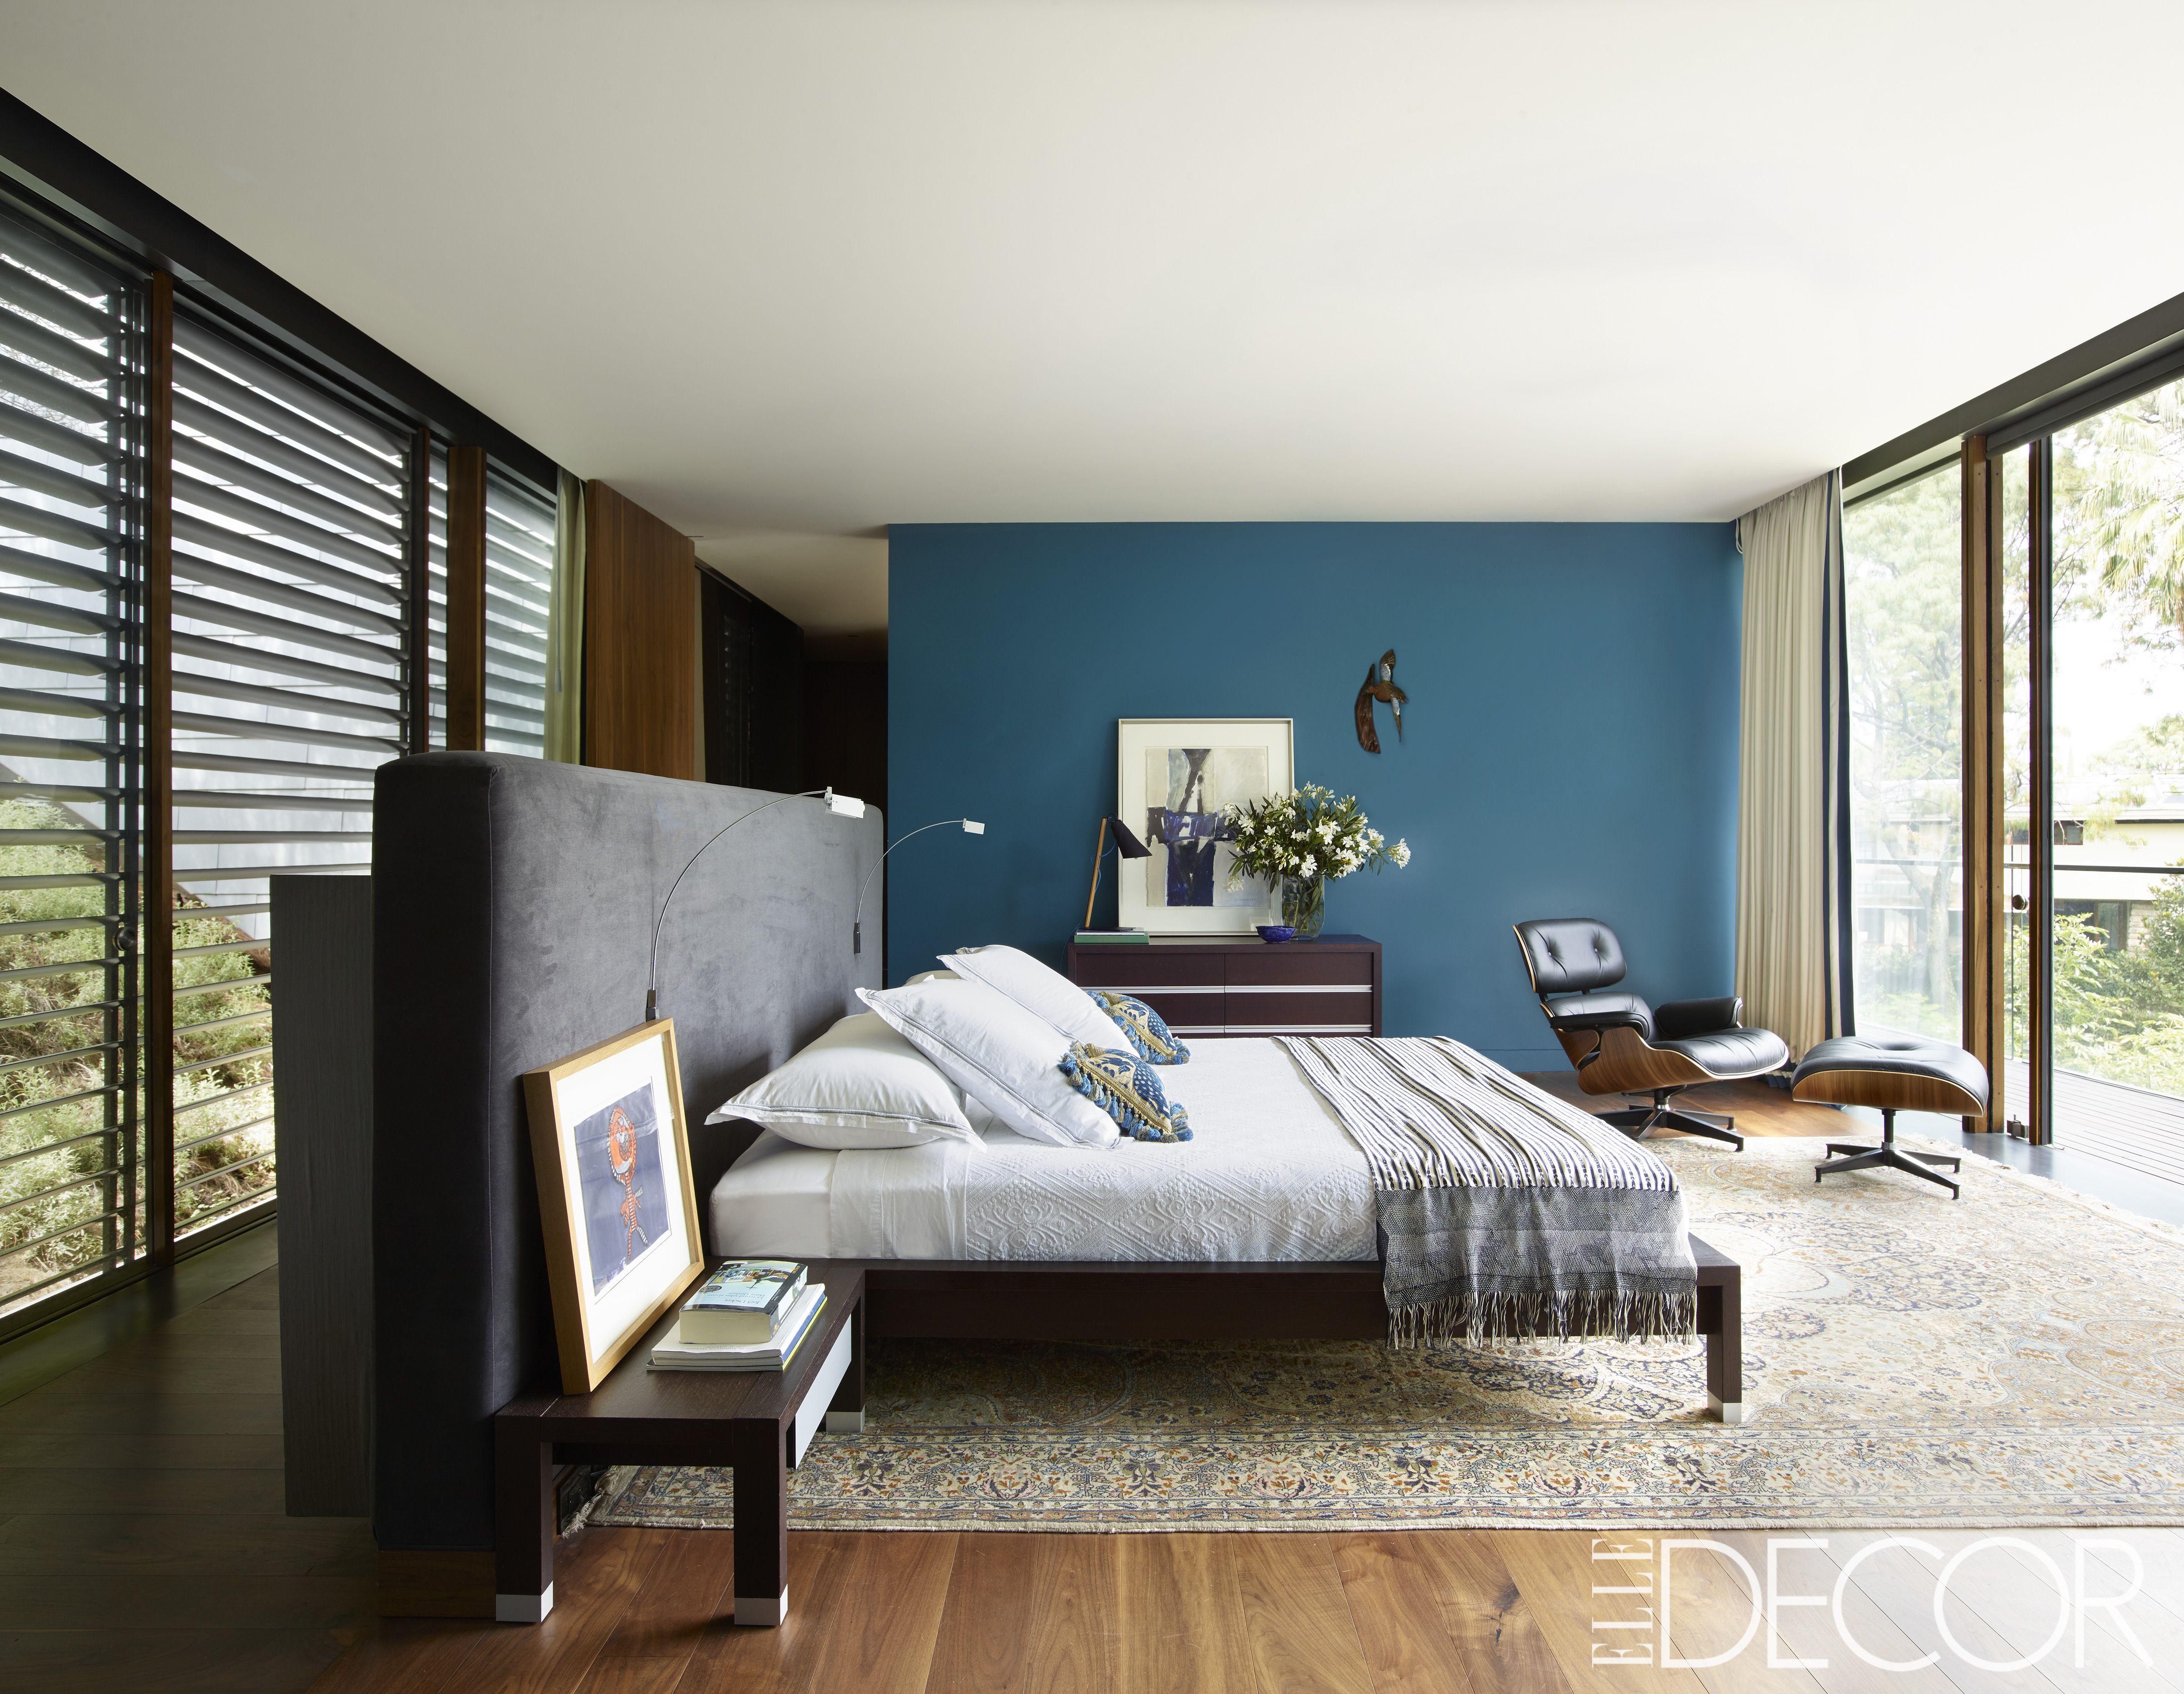 30 Minimalist Bedroom Decor Ideas Modern Designs For Minimalist Bedrooms